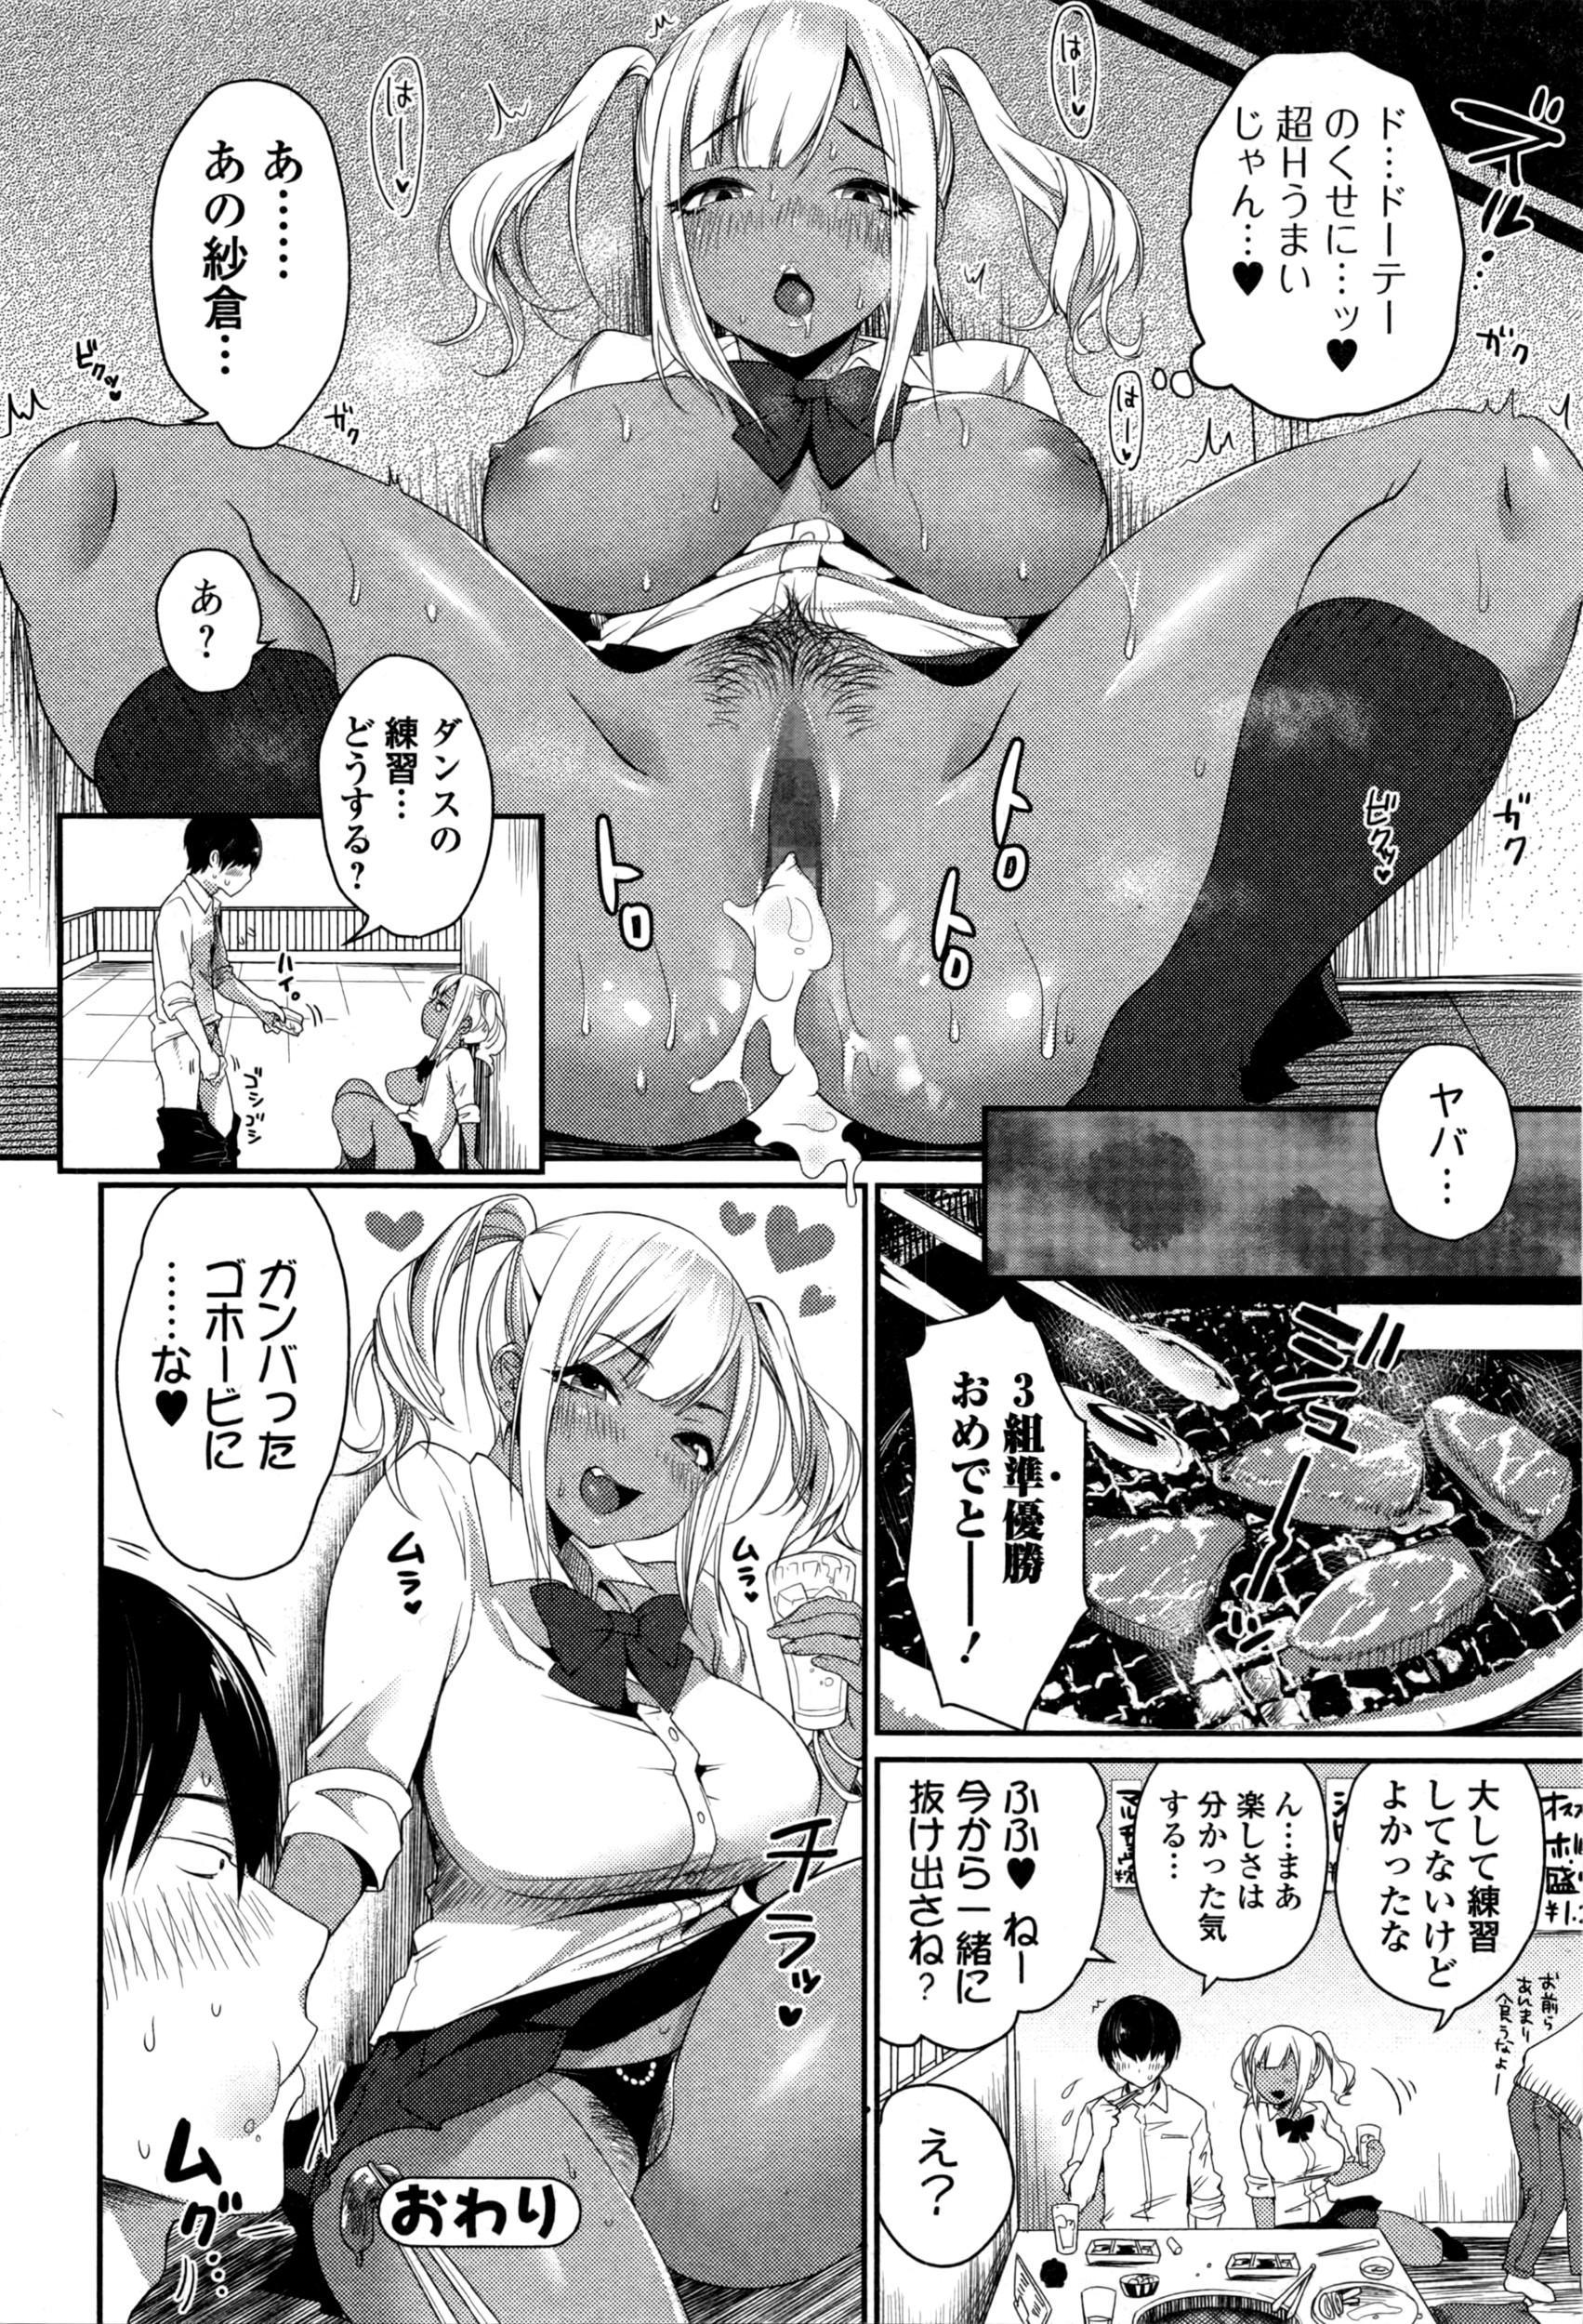 Comic JSCK Vol.3 2016-03 170